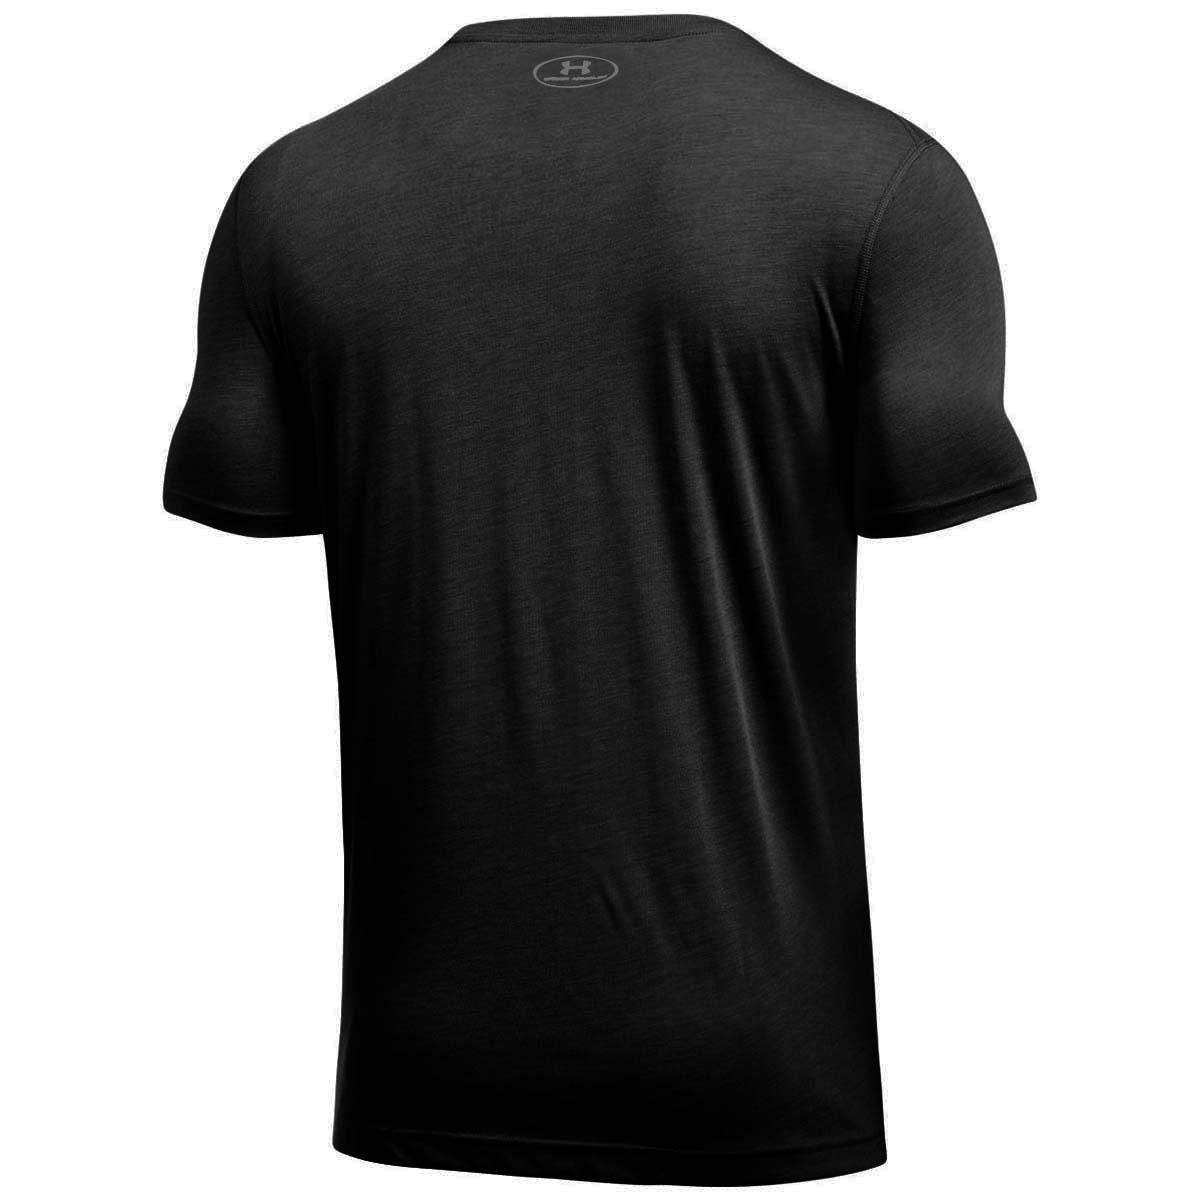 Under-Armour-Mens-UA-Threadborne-Fitted-Short-Sleeve-Gym-Tee-Sport-T-Shirt thumbnail 8